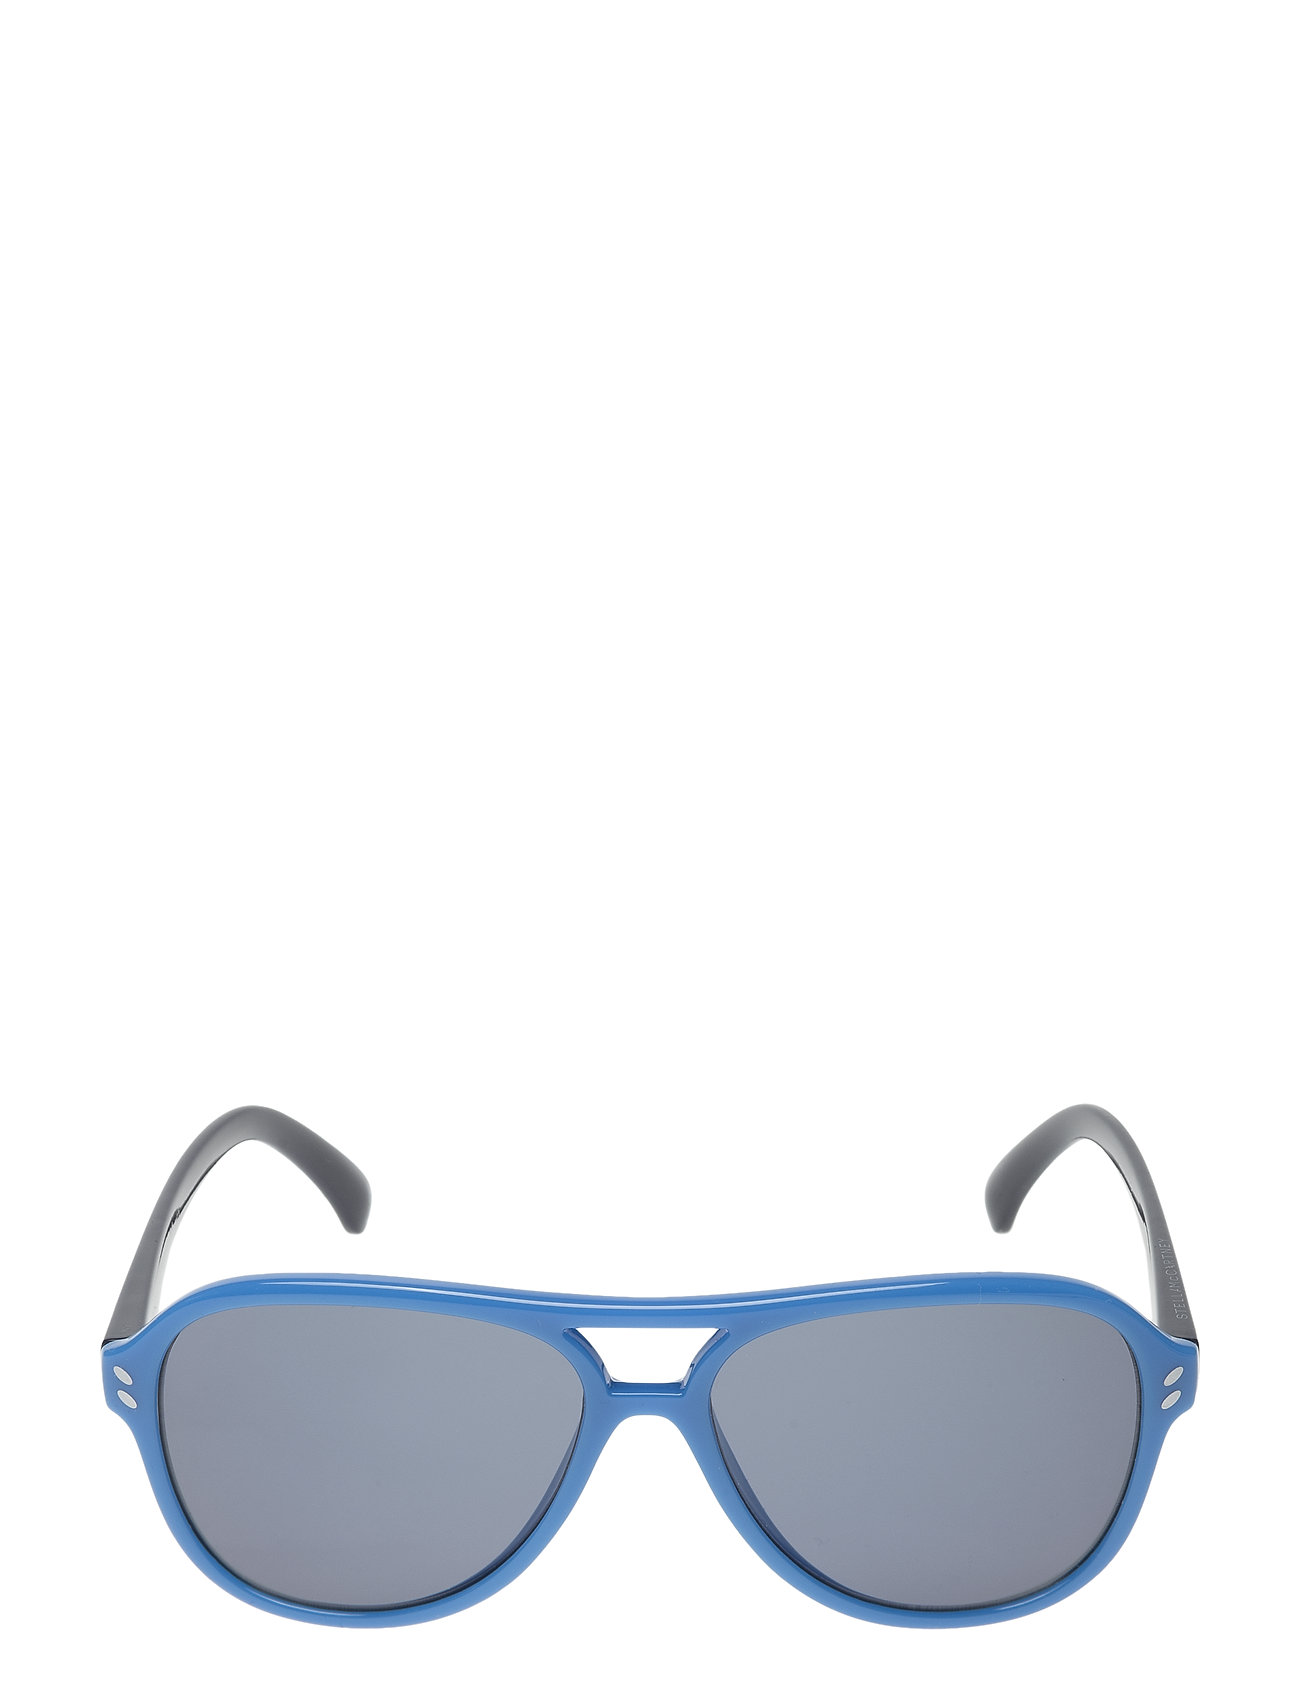 Stella McCartney Eyewear SK0003S - BLUE-BLUE-BLUE